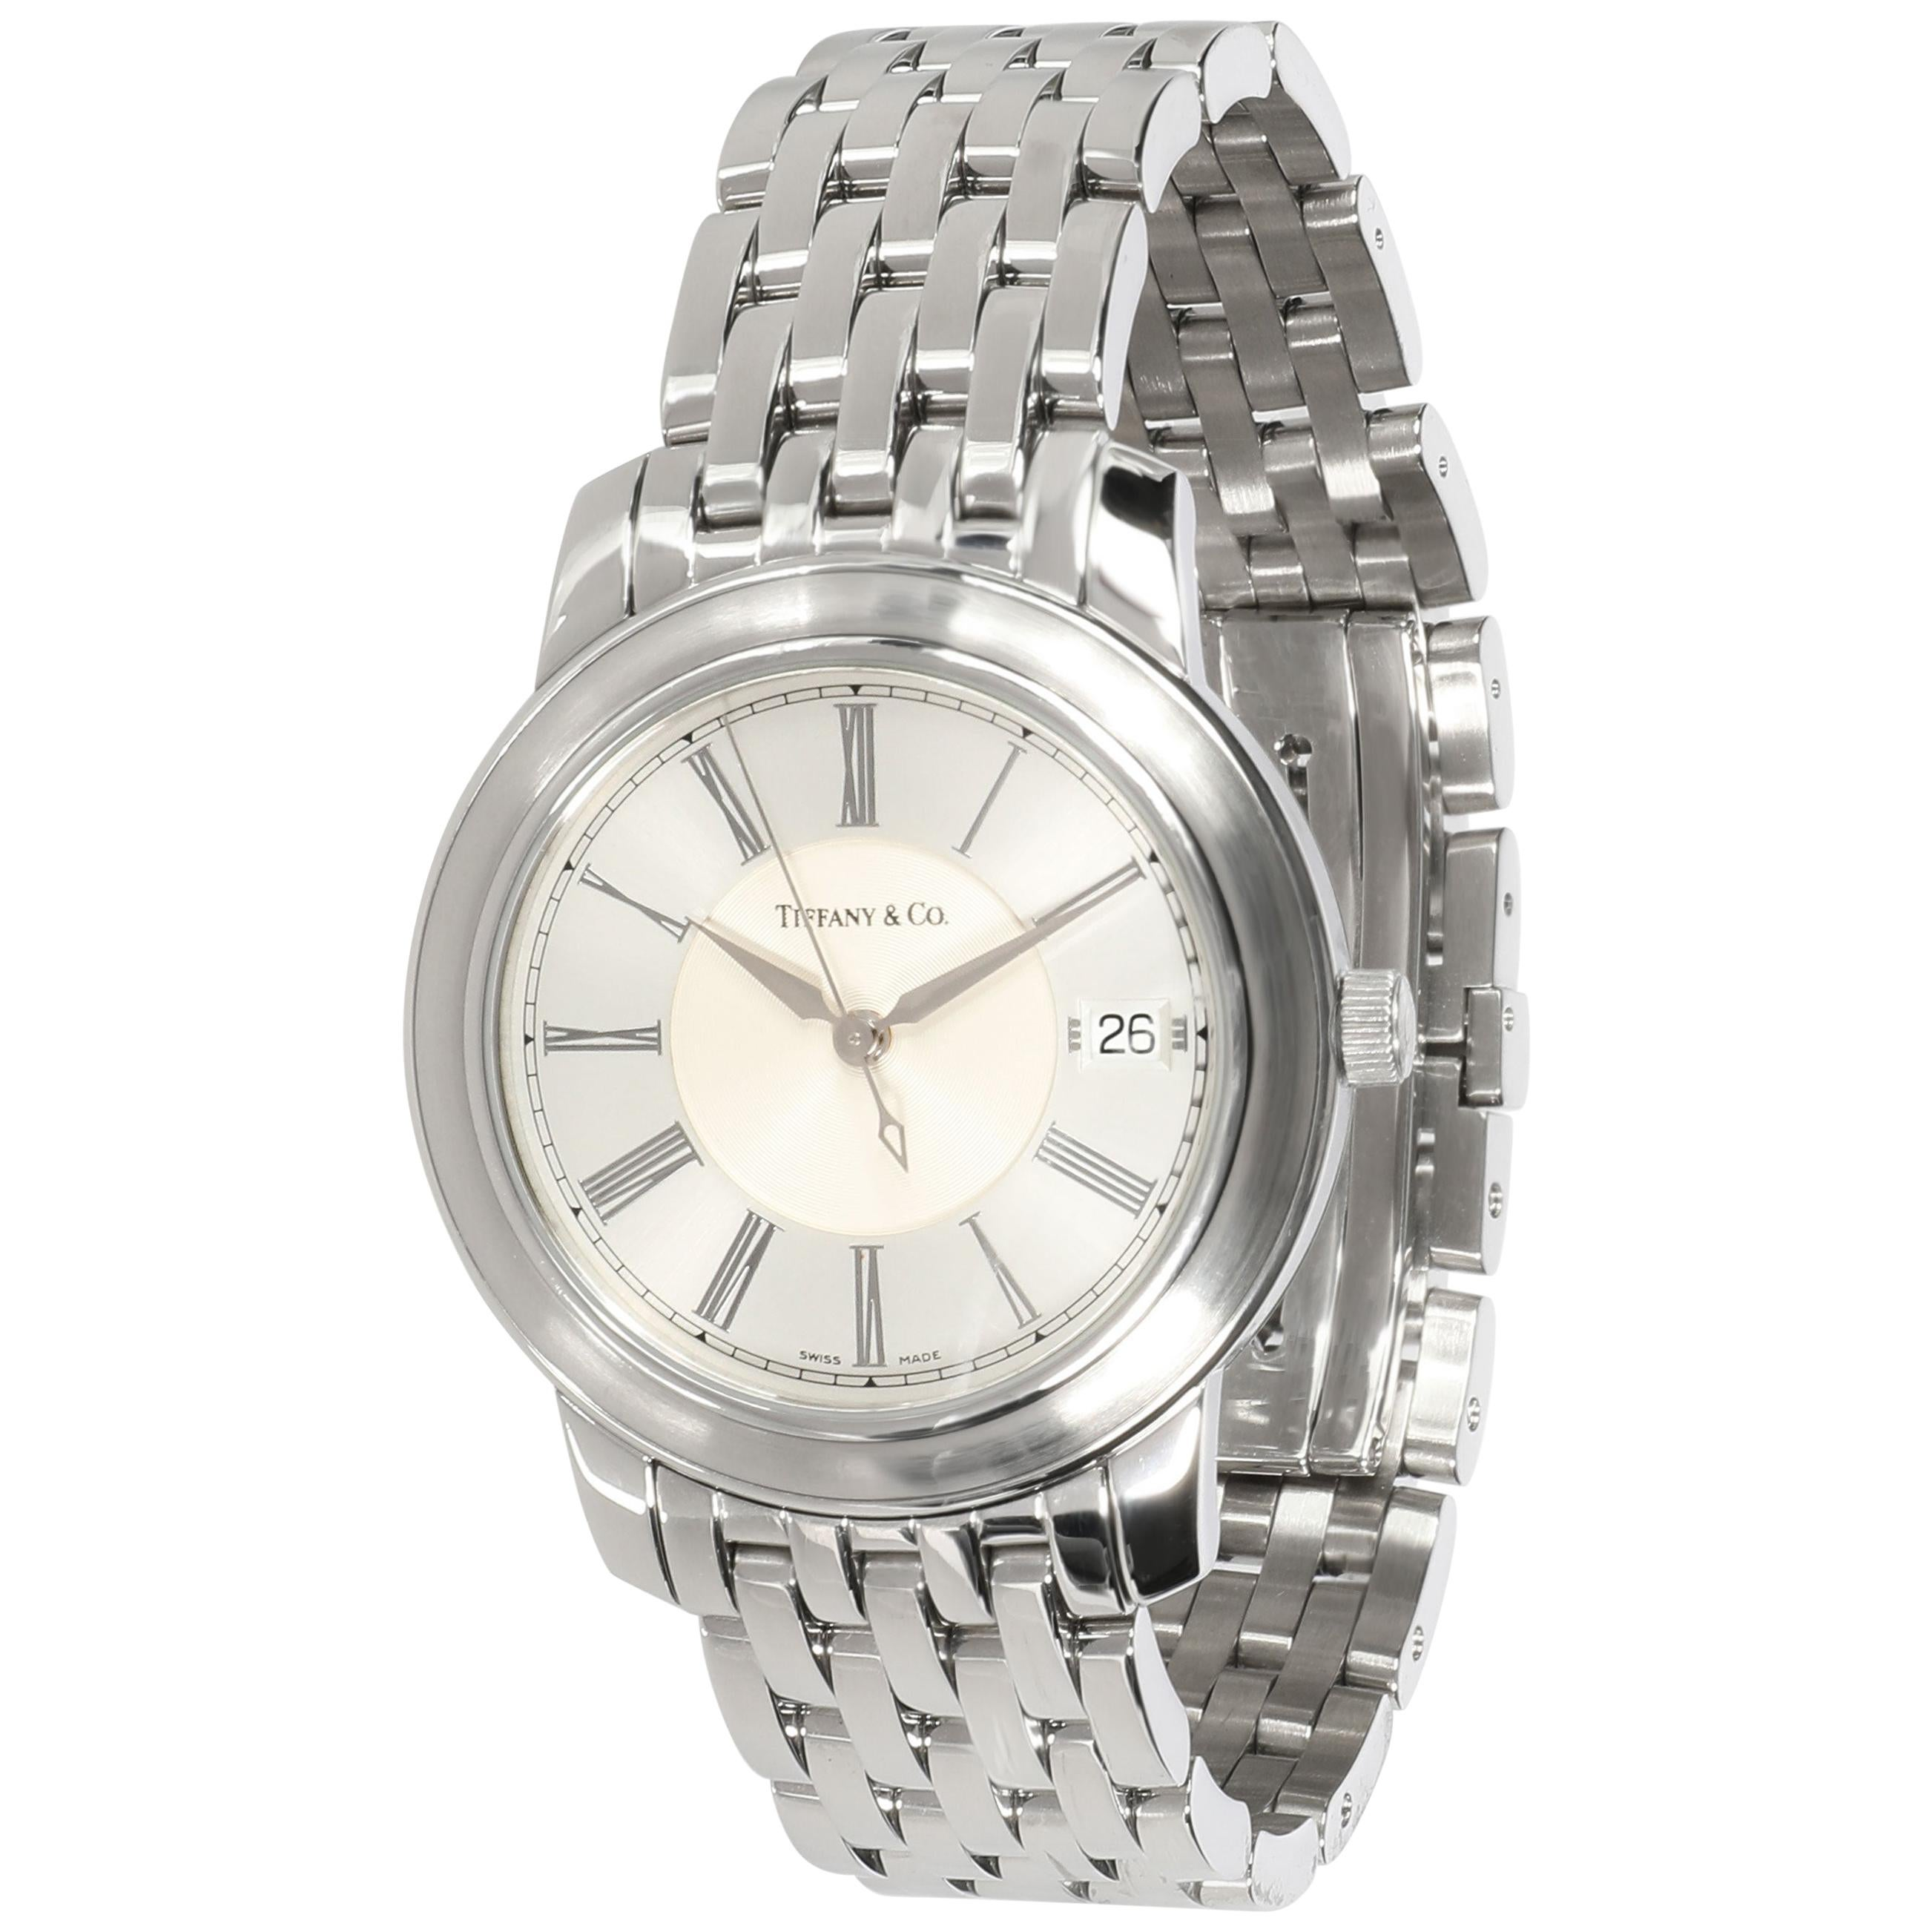 Tiffany & Co. Mark Resonator Mark Resonator Men's Watch in Stainless Steel